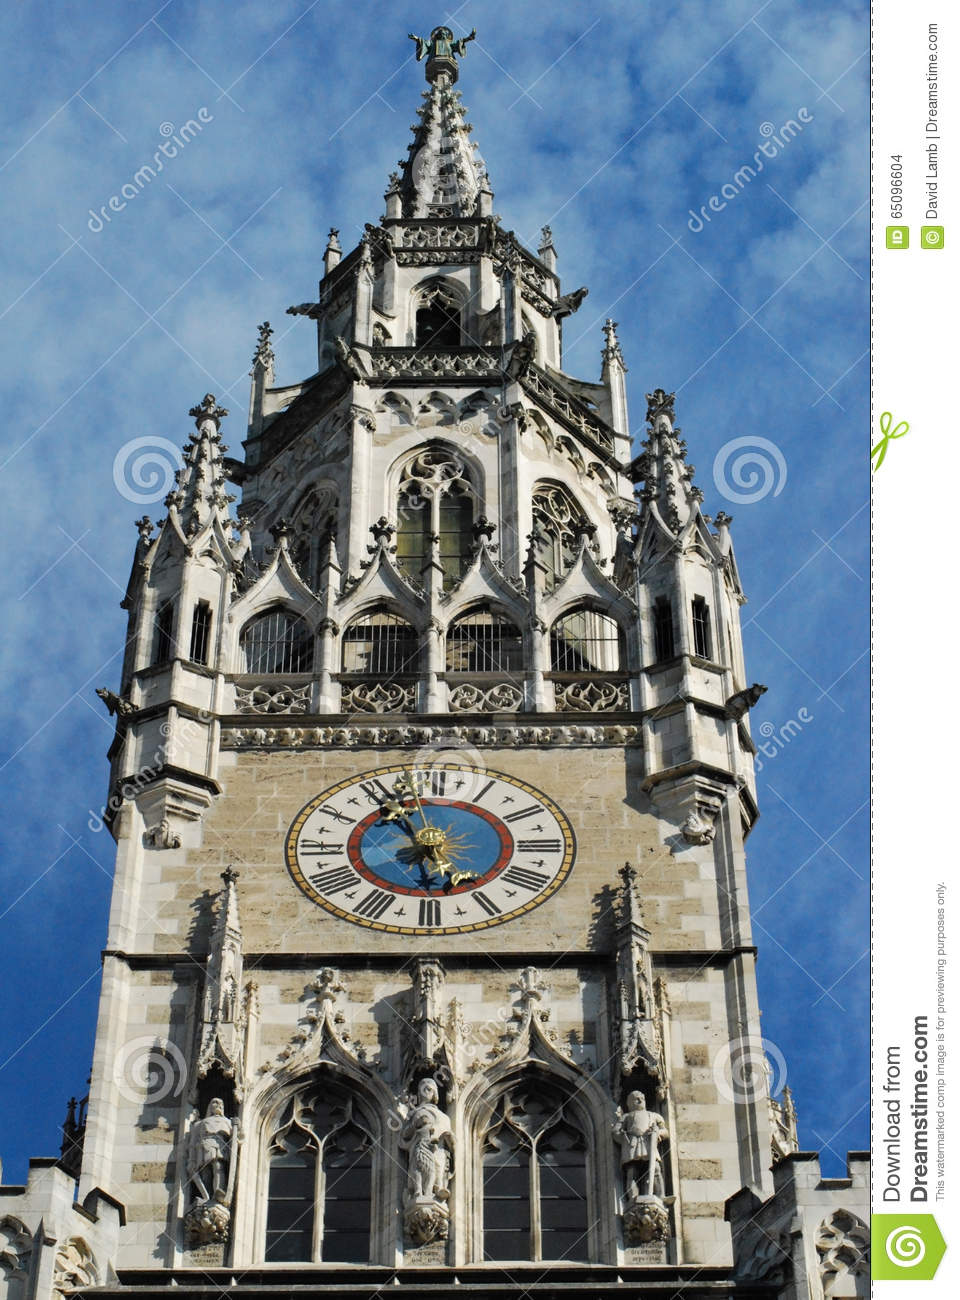 Munich Town Hall Clock Stock Photo.